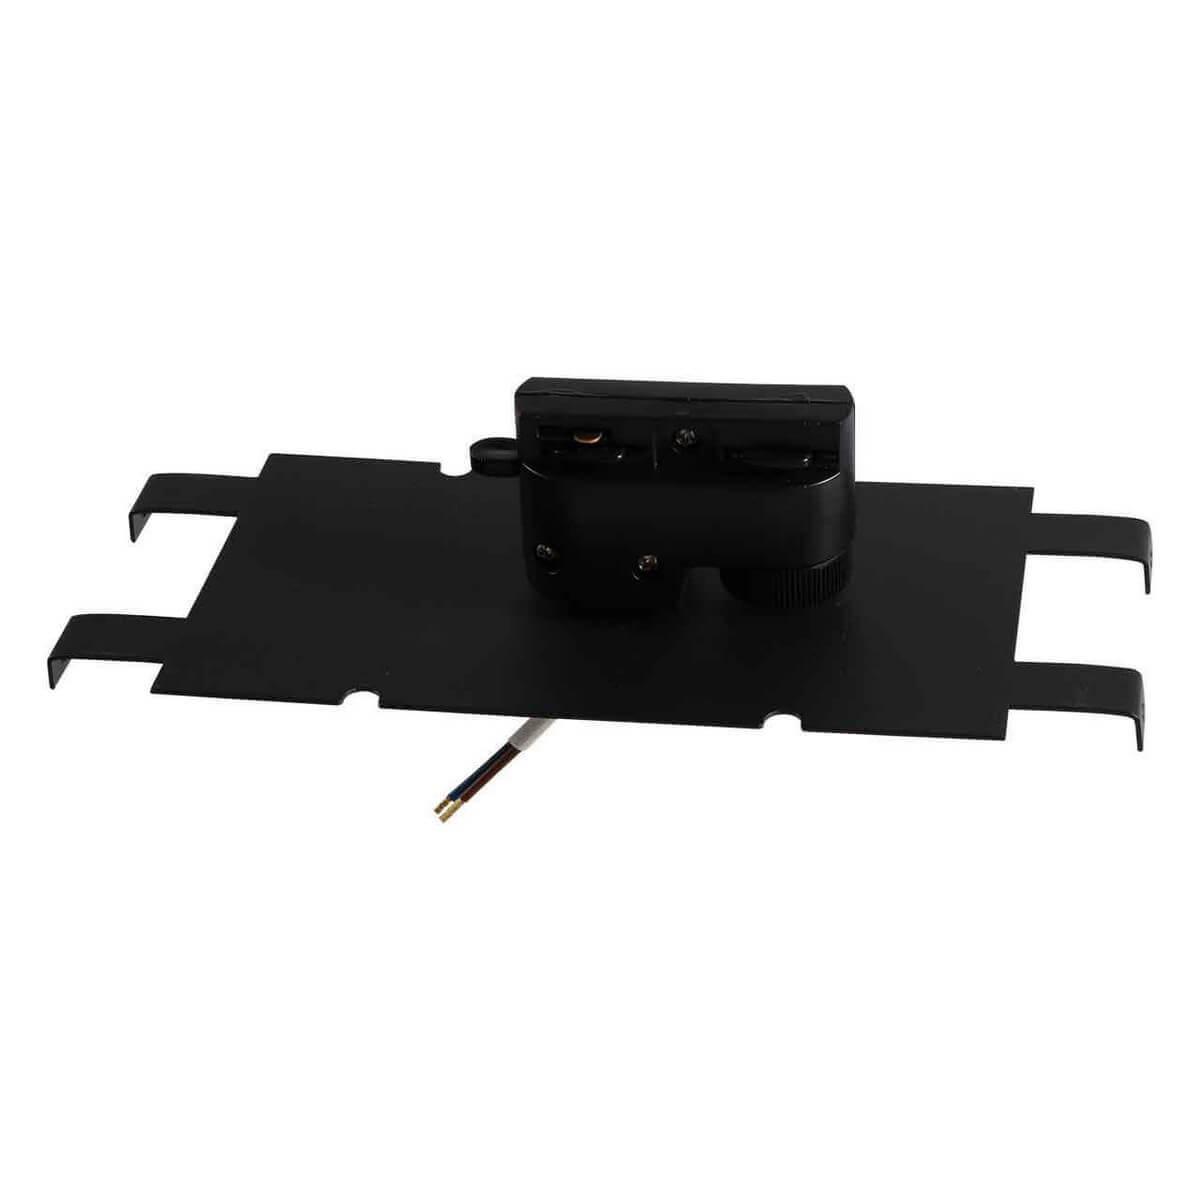 Адаптер для шинопровода Lightstar 592047 Asta Black (для однофазного шинопровода) фото